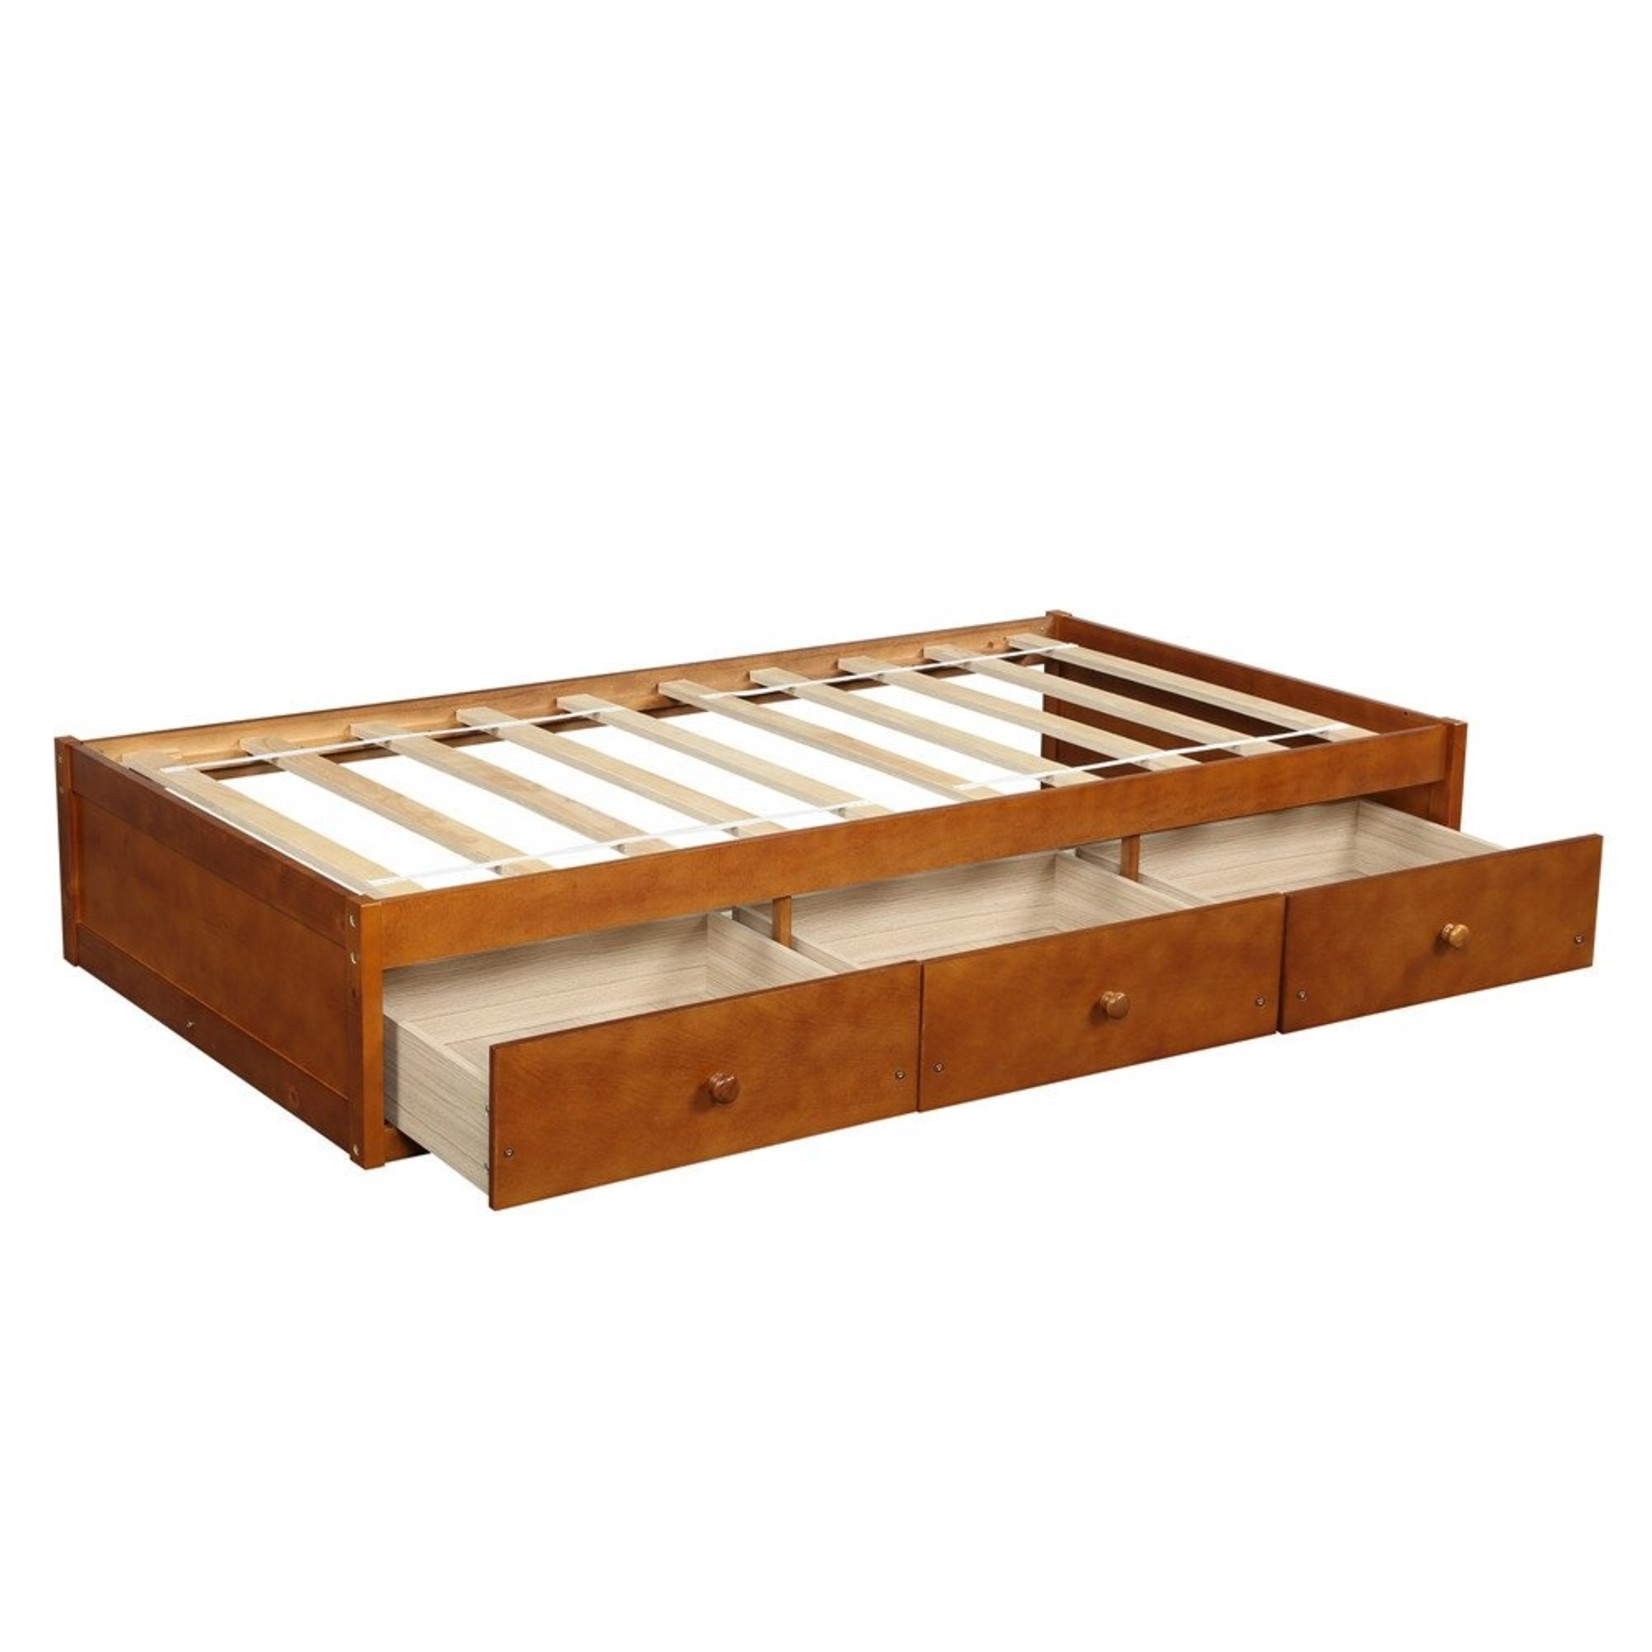 *Twin - Sohn 3 Drawer Solid Wood Platform Bed